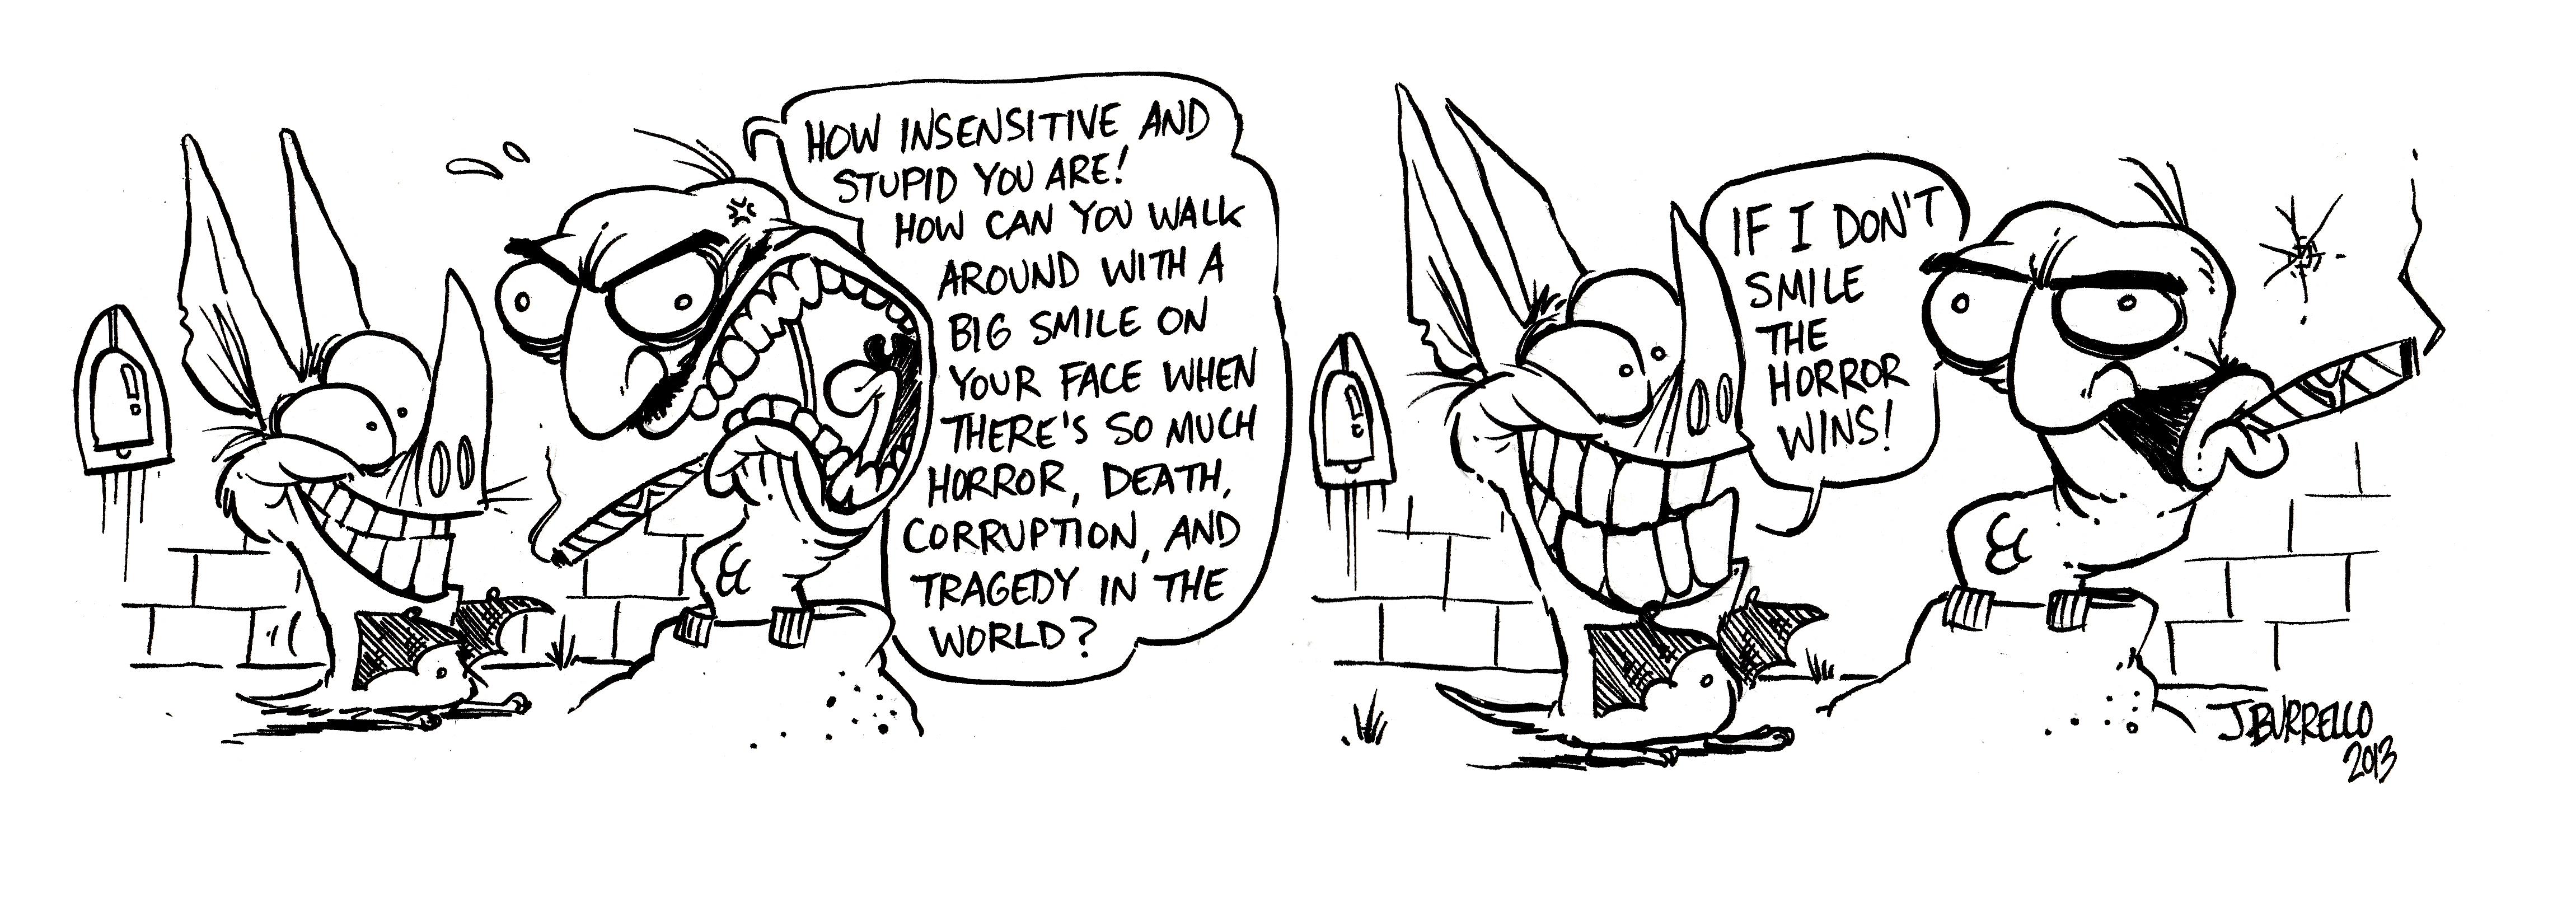 bat and smiles